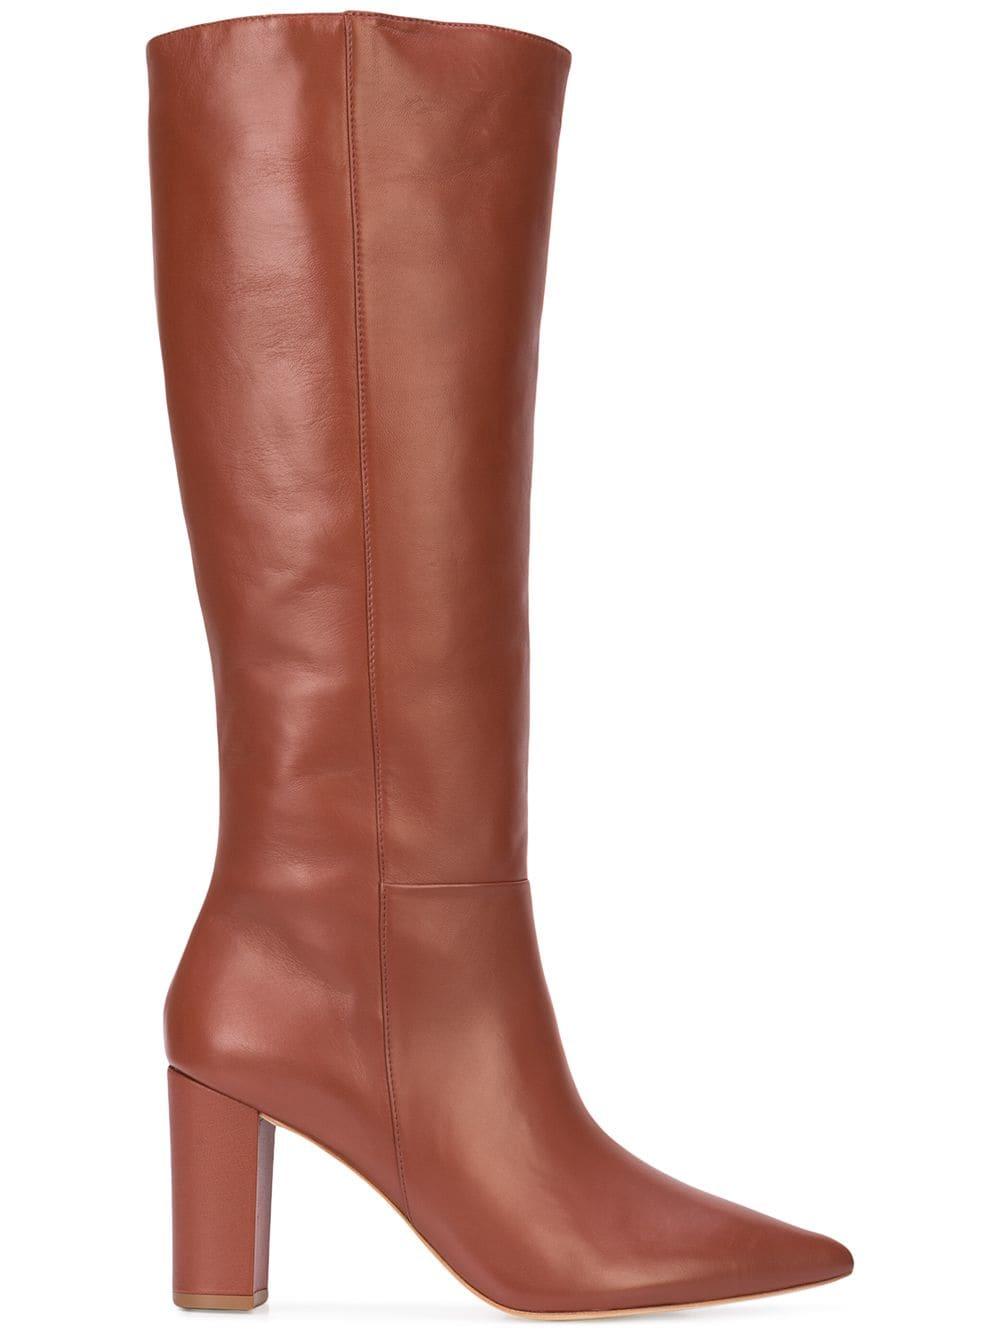 Ulla Johnson jerri boots - shop